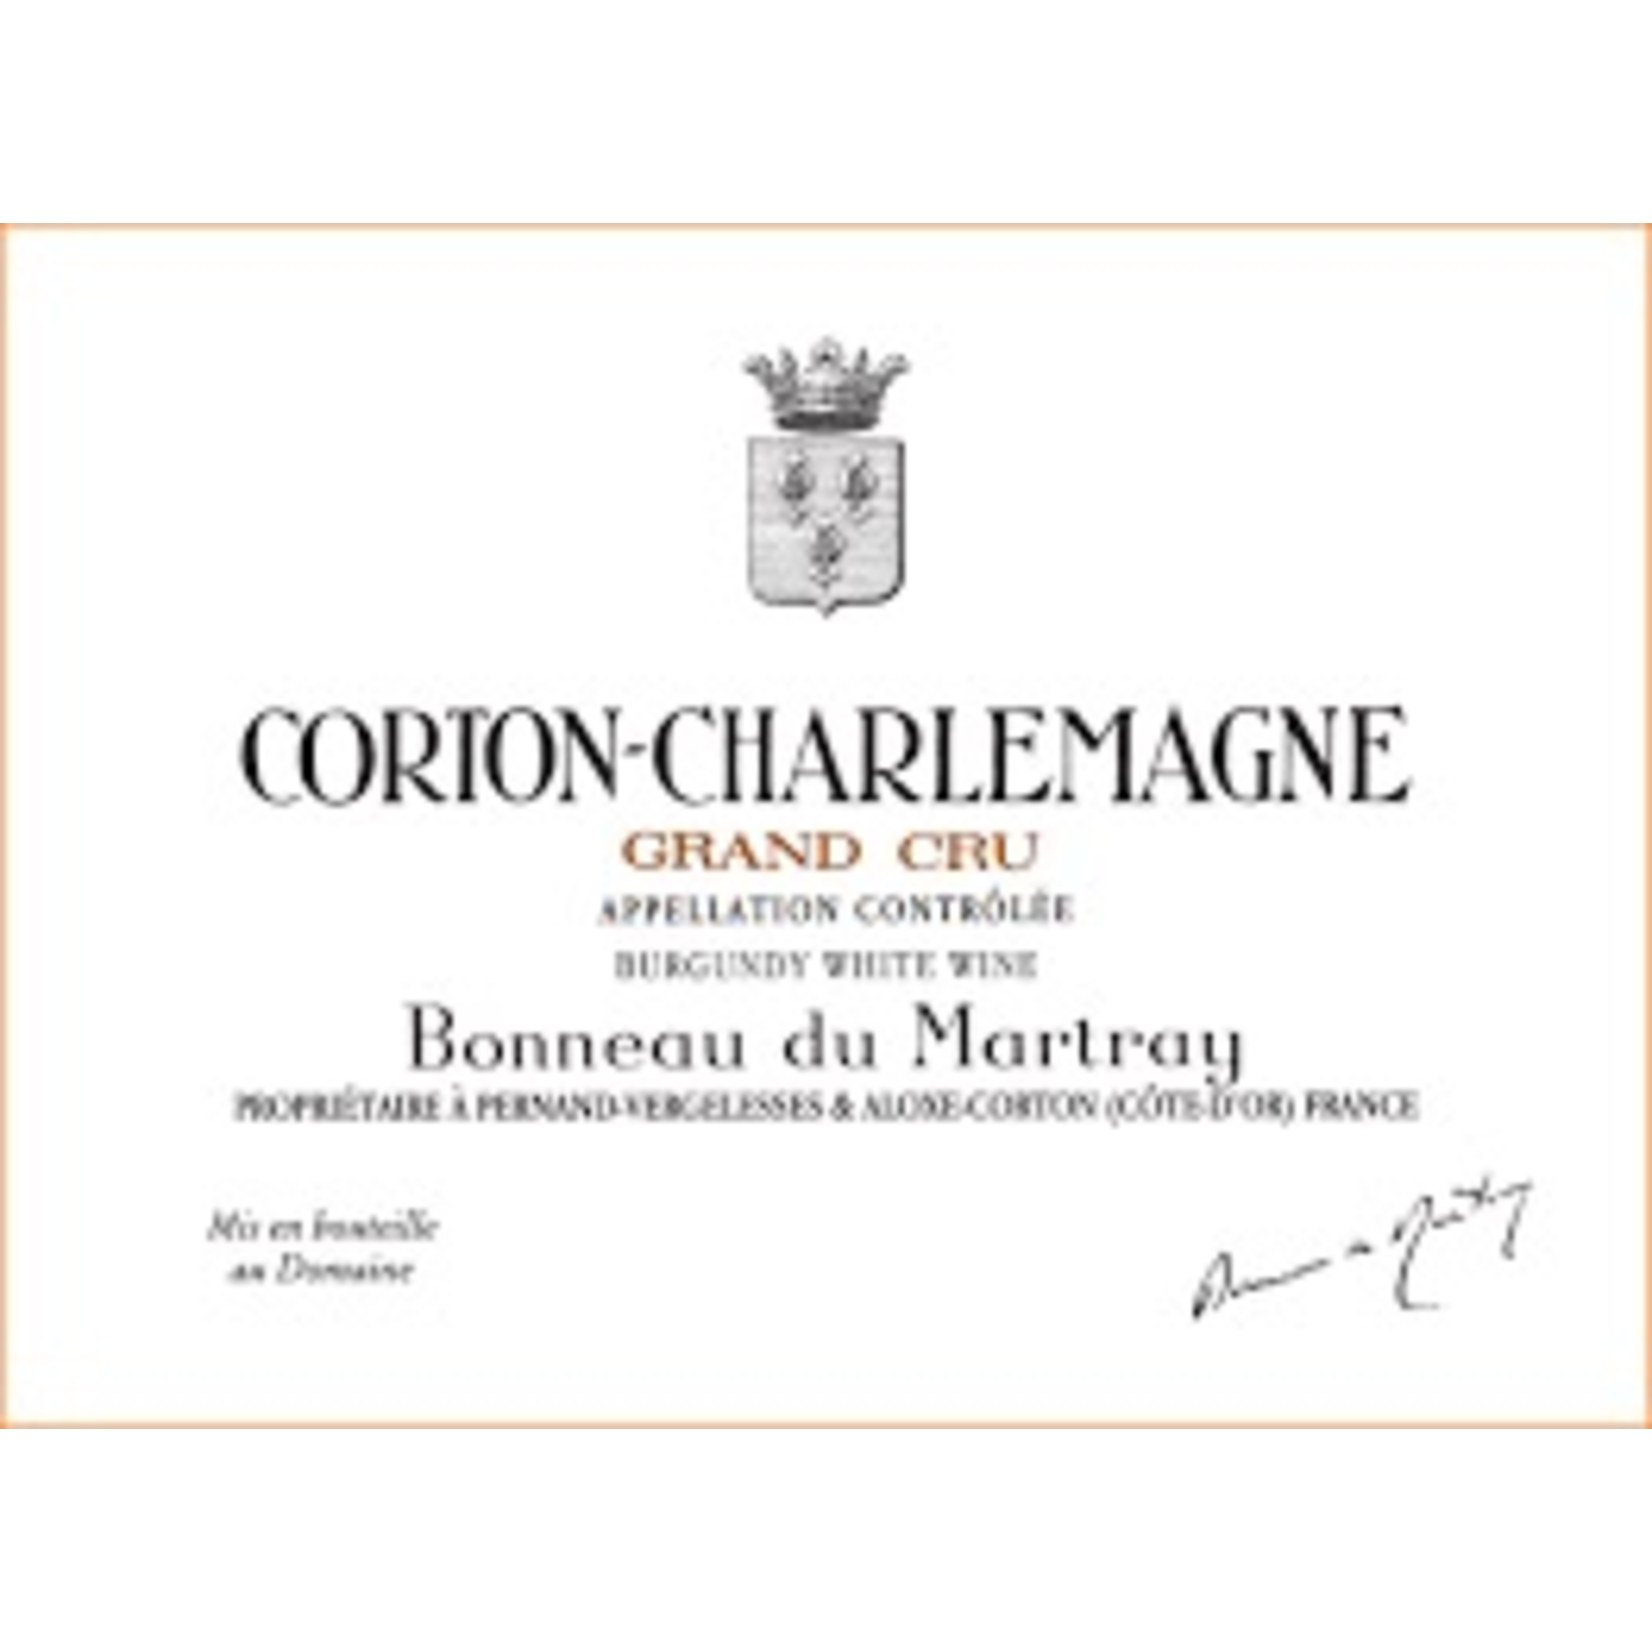 Wine Domaine Bonneau du Martray Corton Charlemagne Grand Cru 2003 1.5L